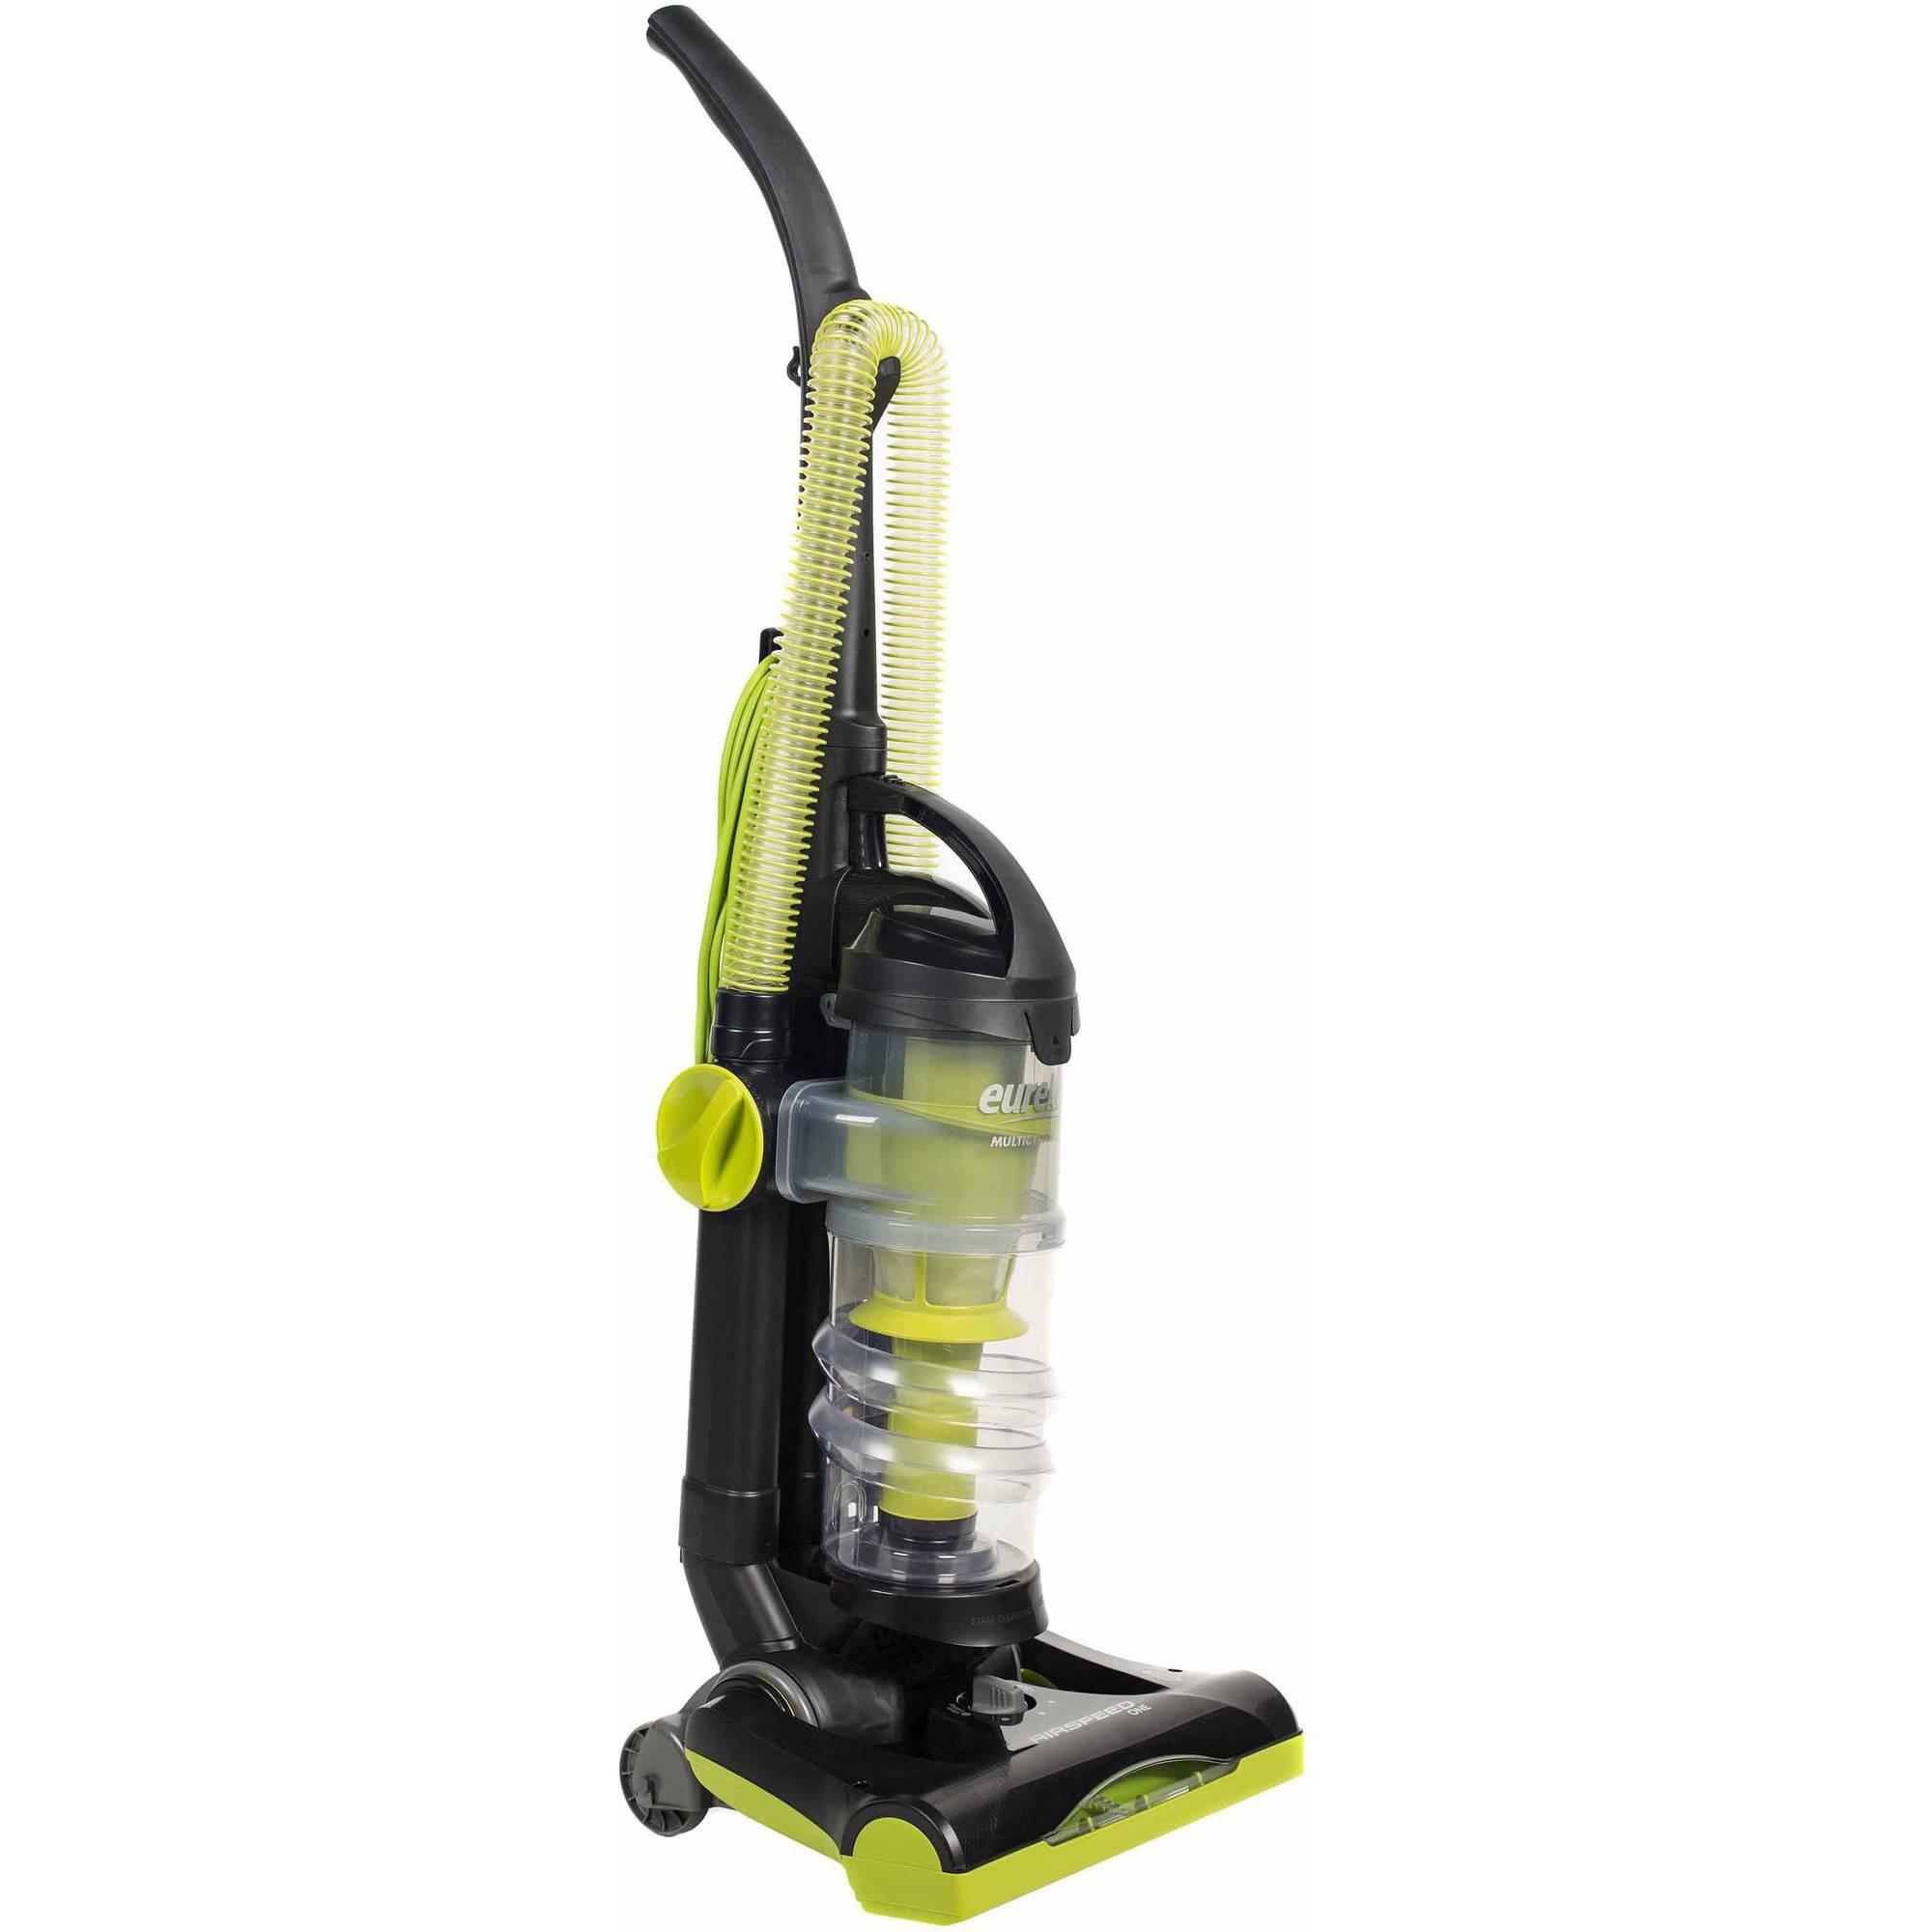 Review of Eureka Maxima 4700A Upright Vacuum